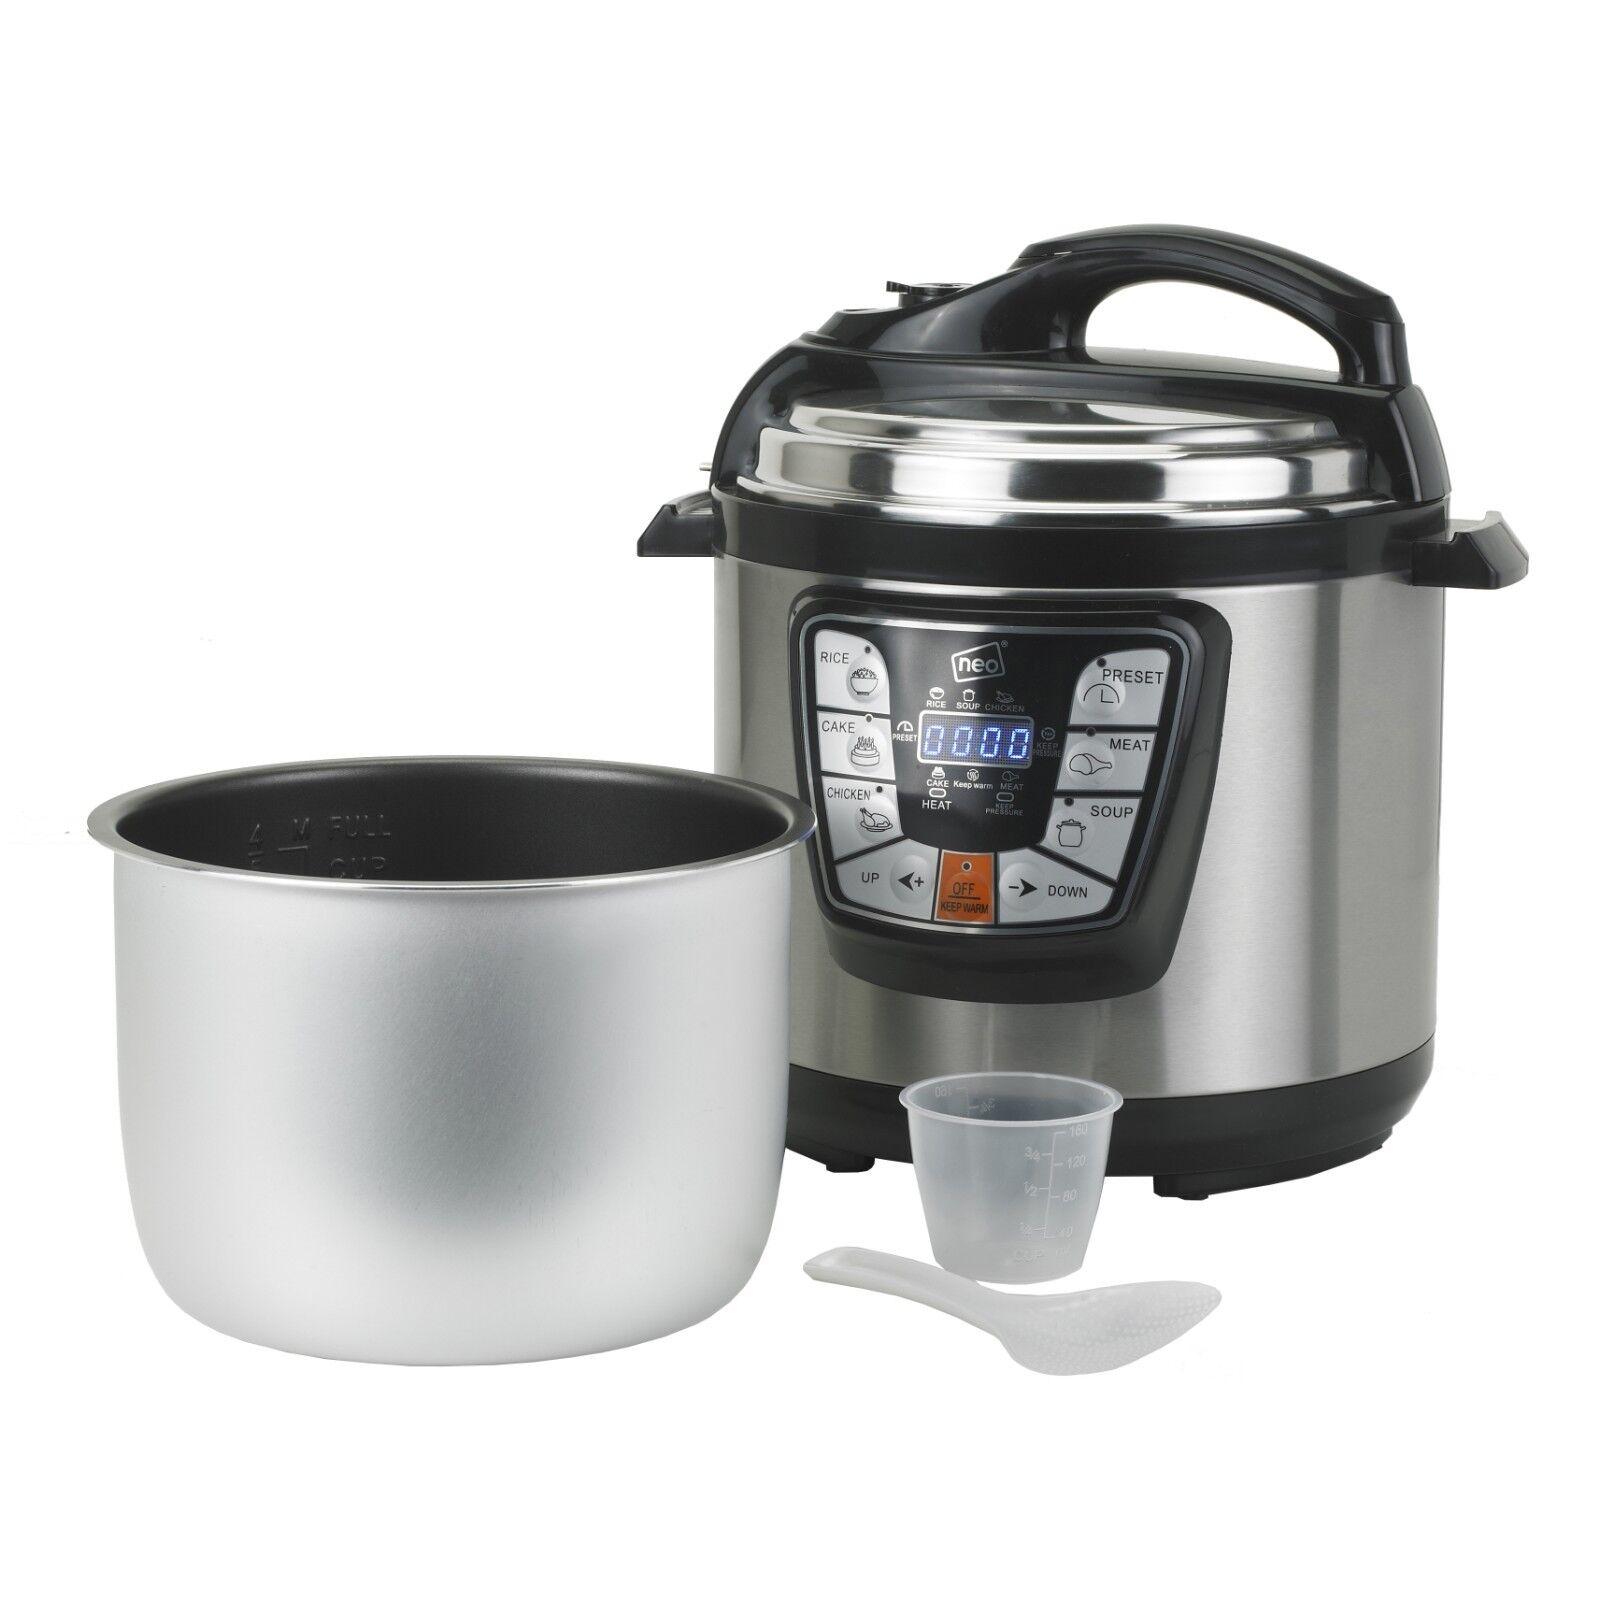 thinkkitchen multifunction pressure cooker manual